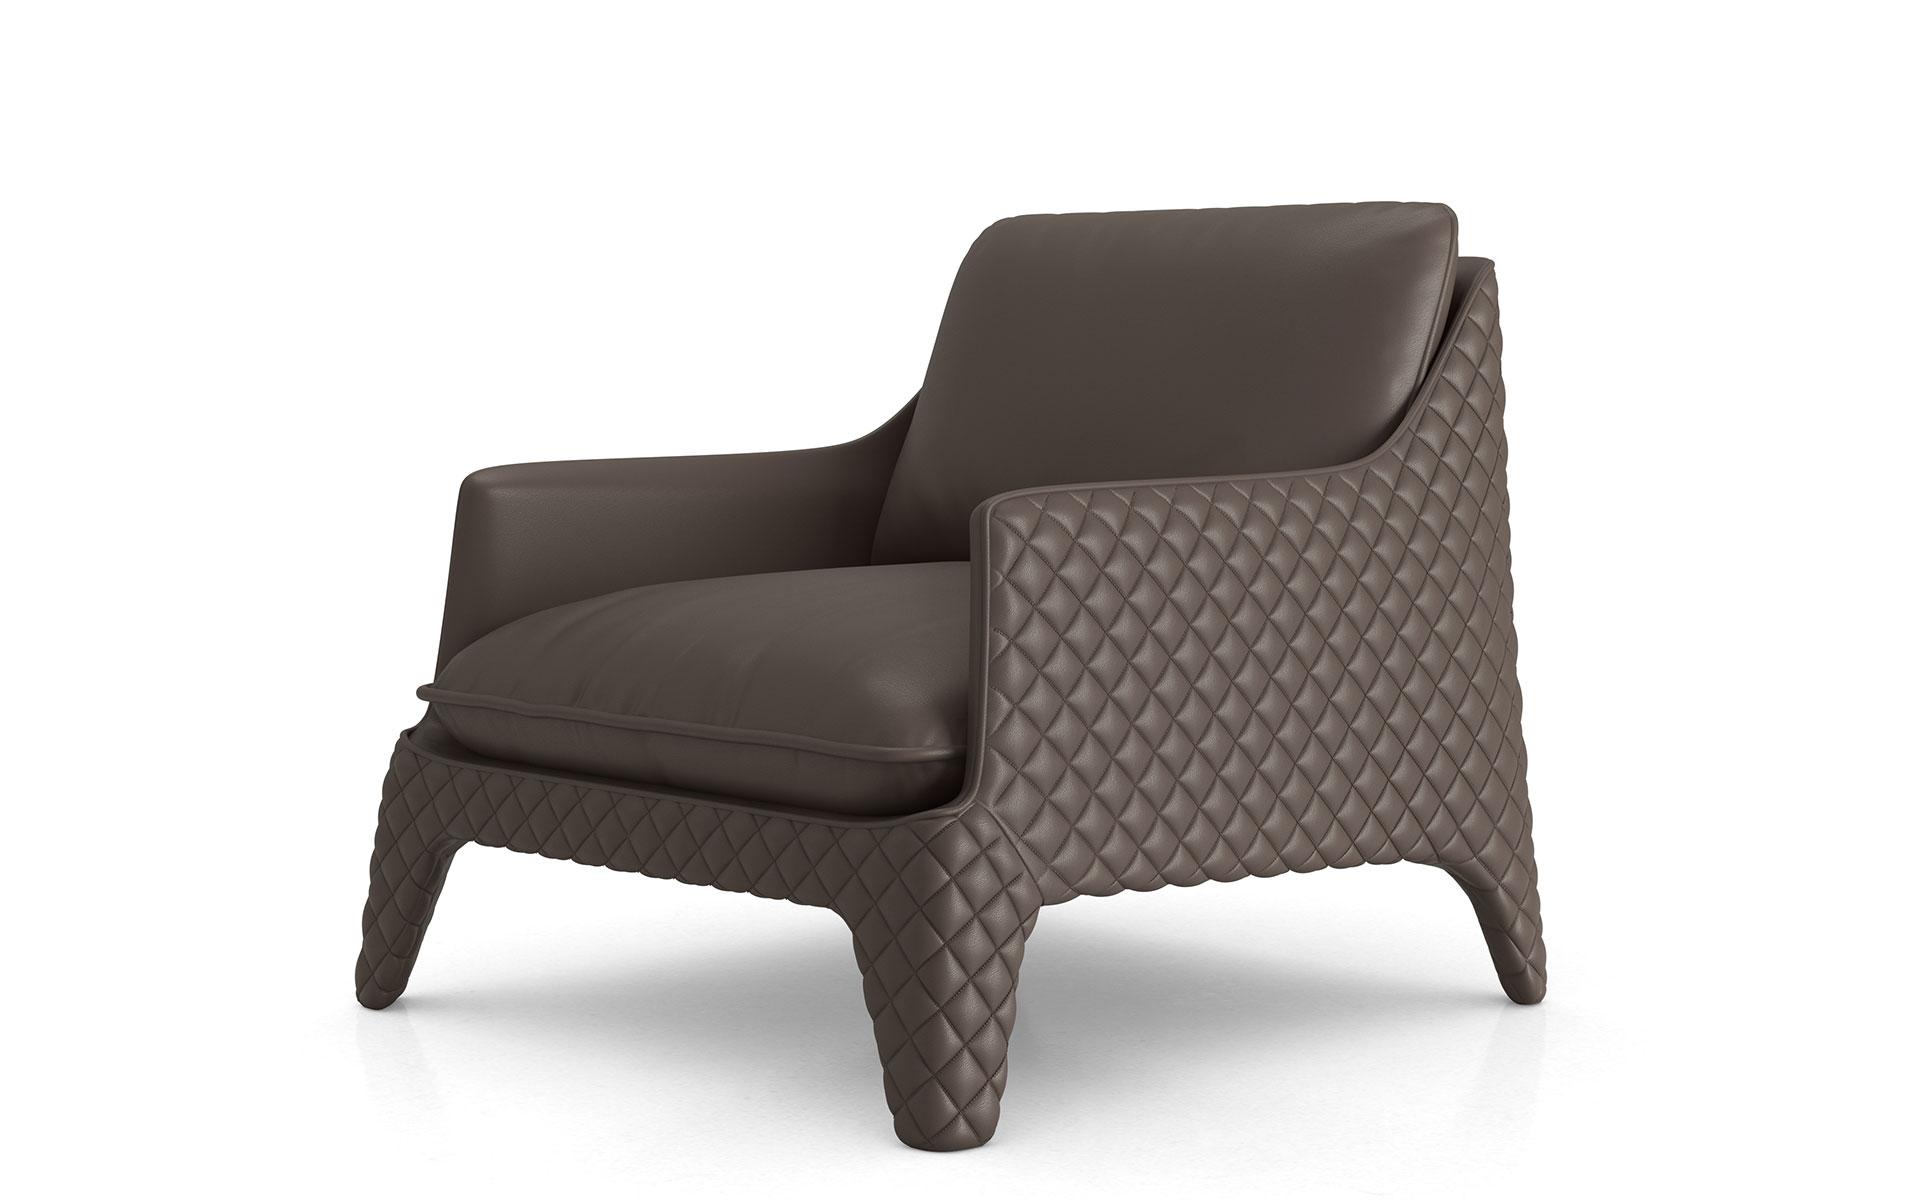 Chatham Lounge Chair